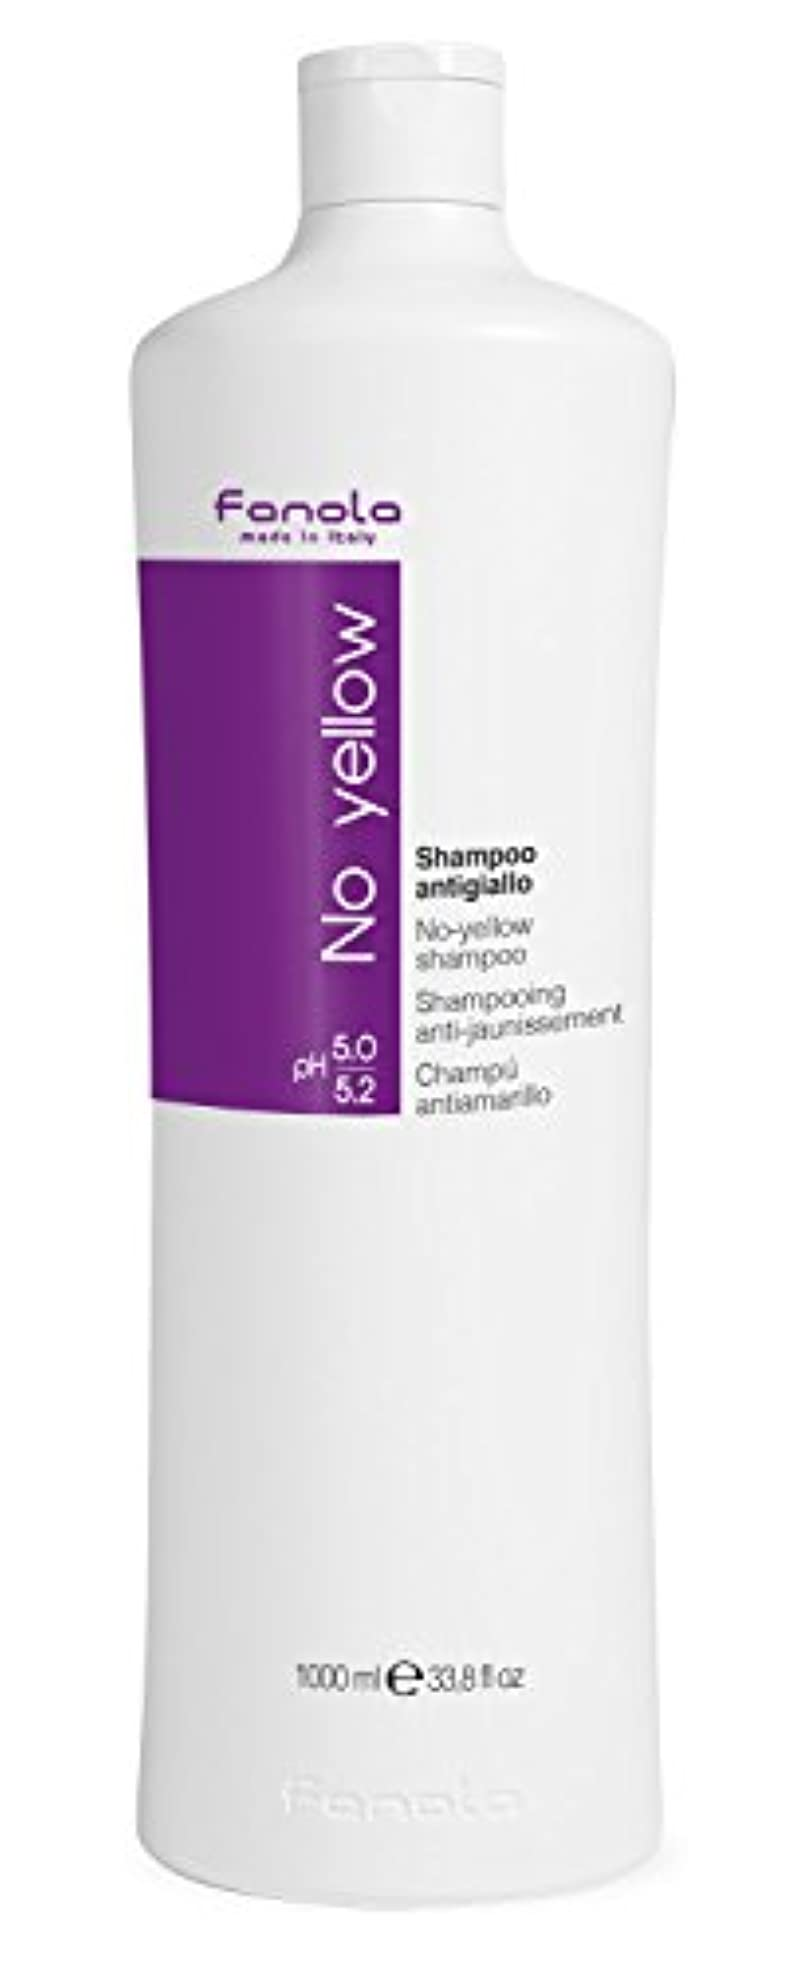 Fanola No Yellow Shampoo Large...